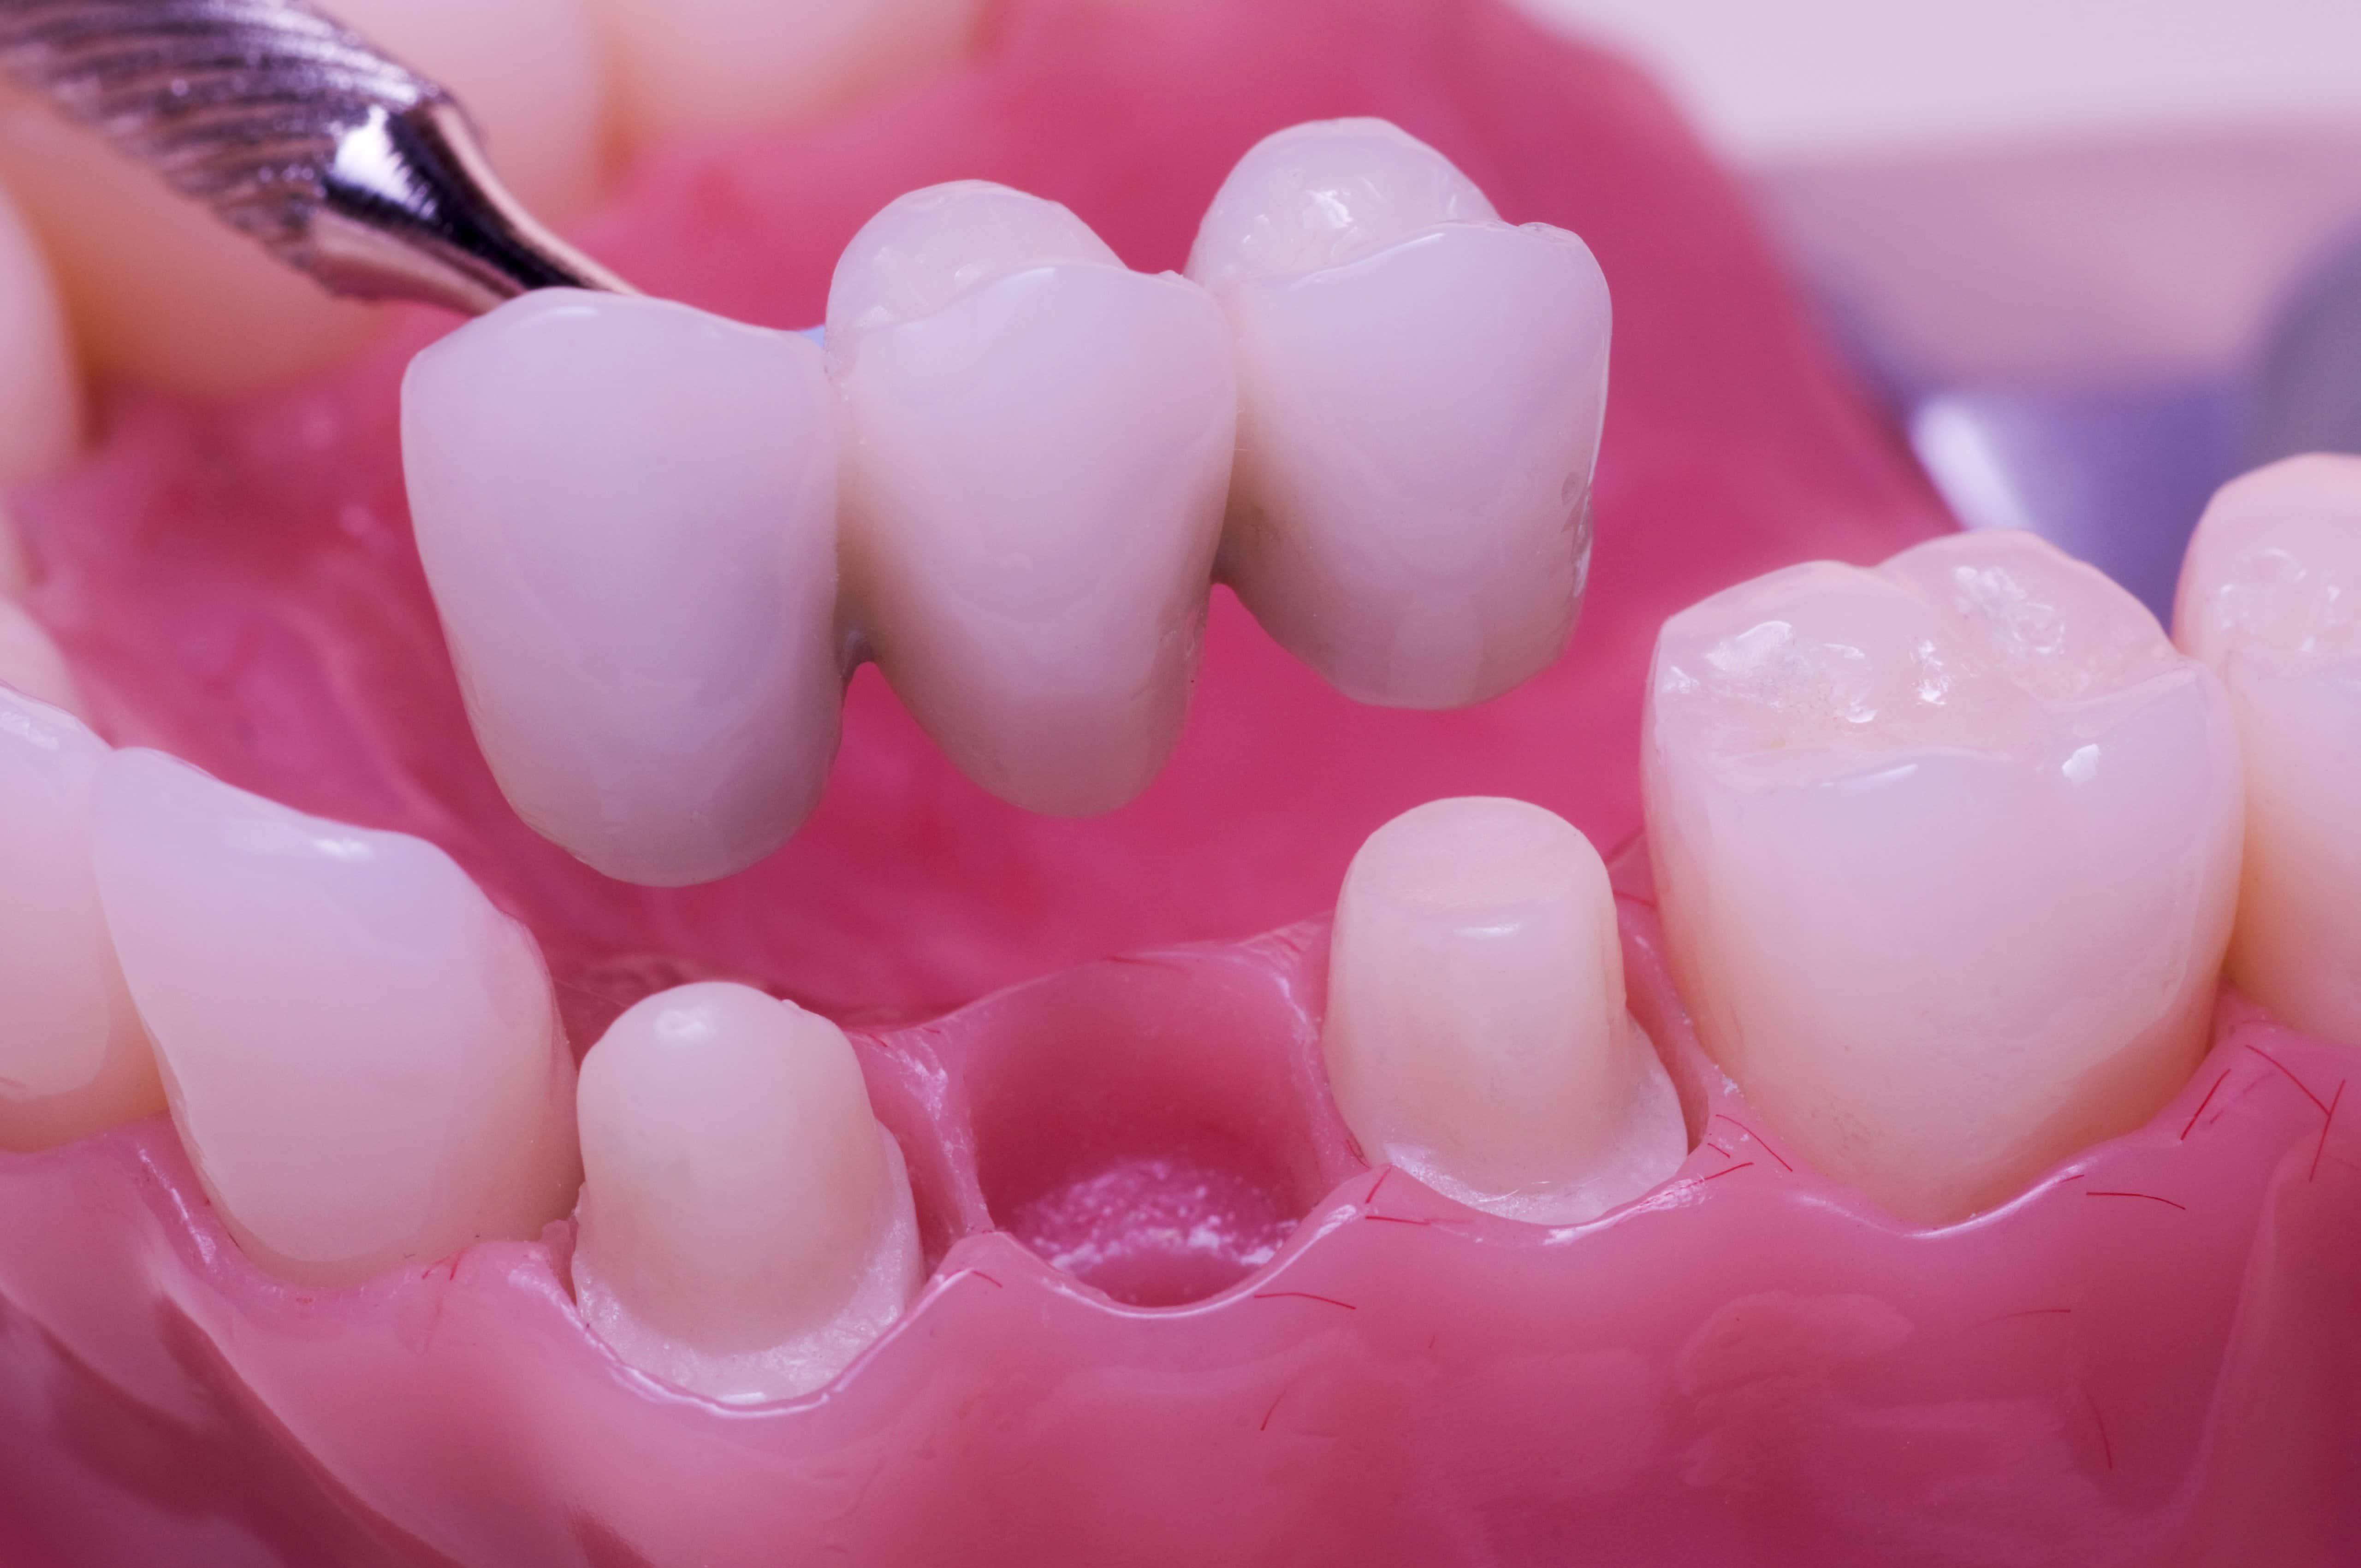 dental crowns and bridges